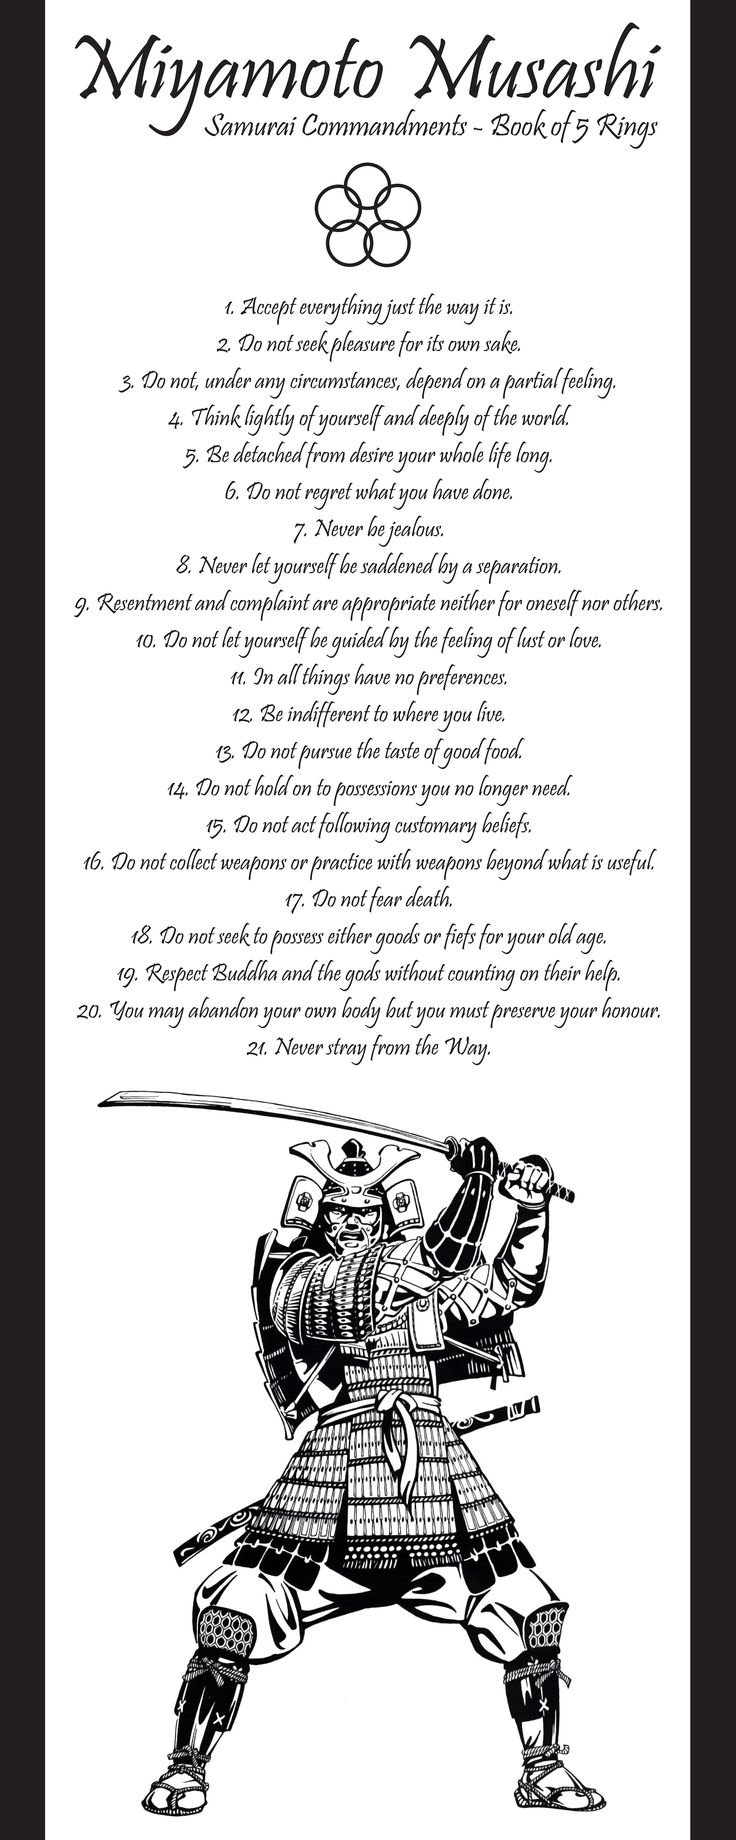 Samurai Commandments - Book of 5 Rings